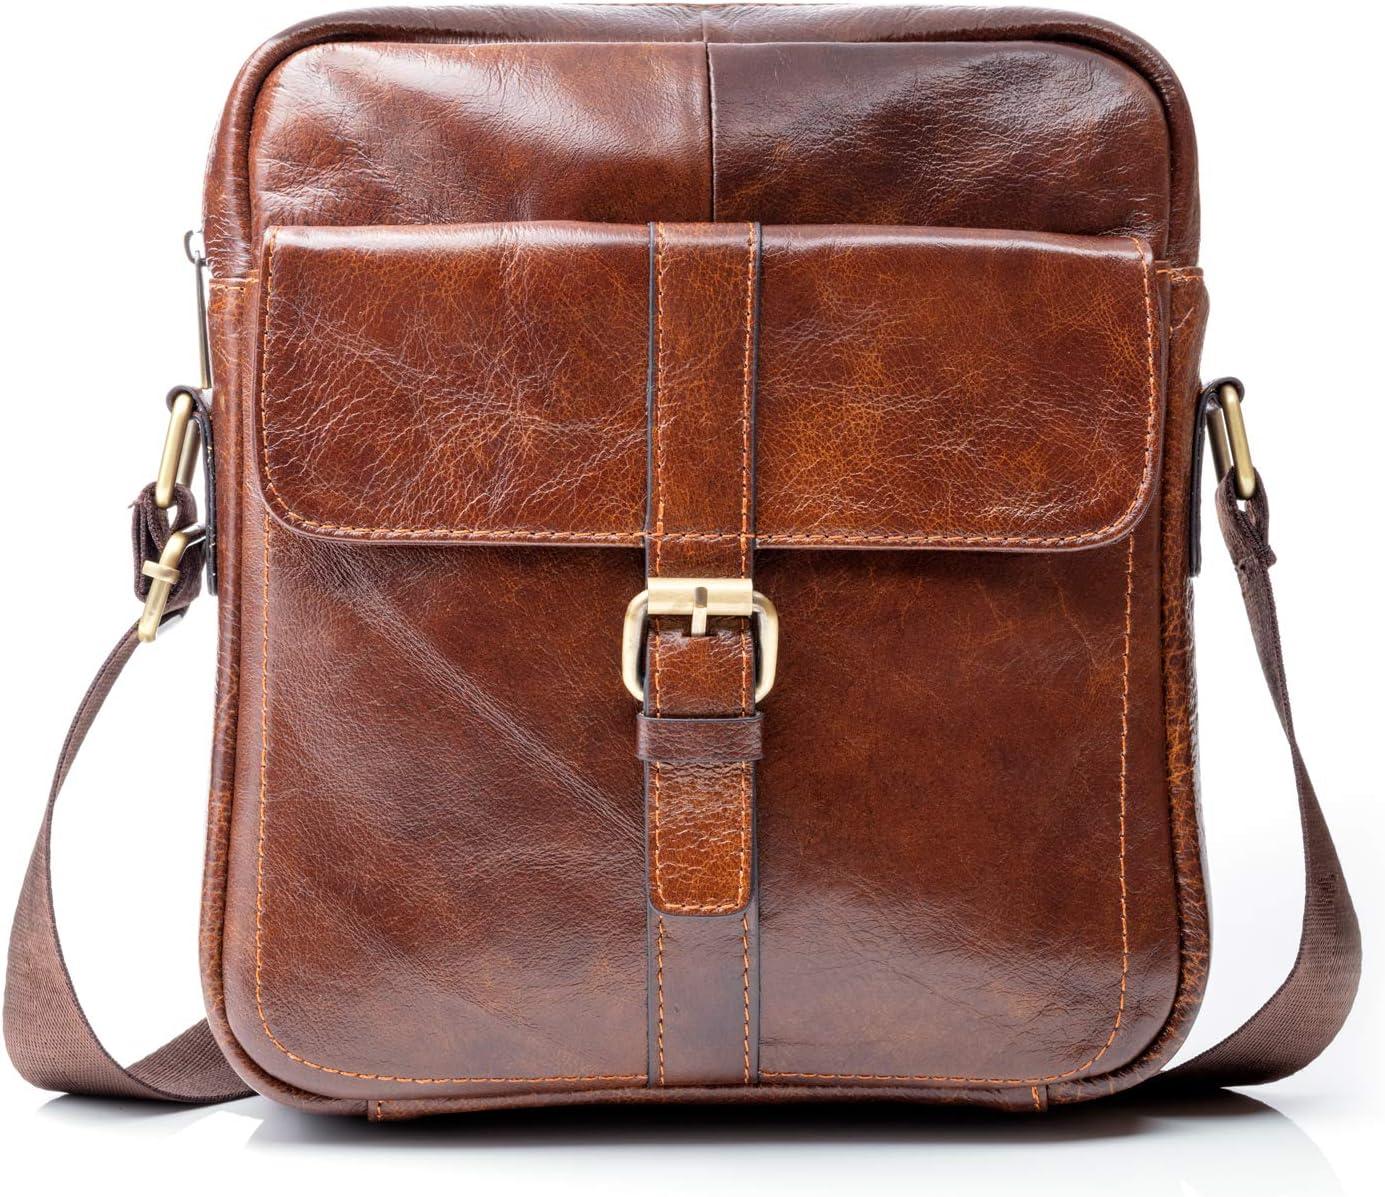 Genuine Leather Crossbody Man Bag Color Dark Brown